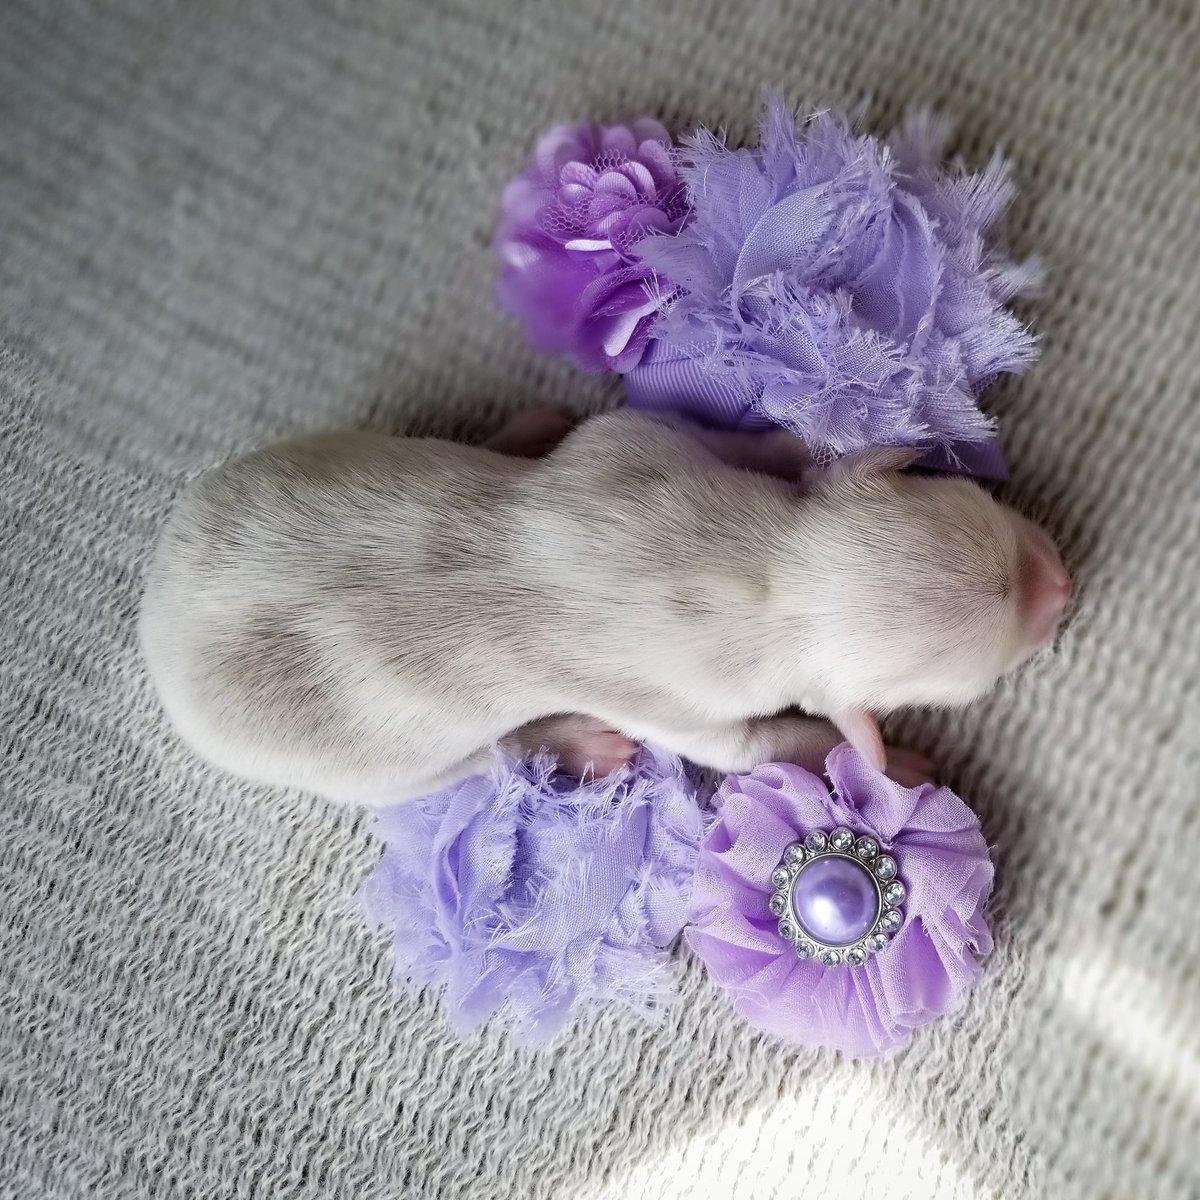 #tinypawsllc #rarechihuahua #lilacmerlechihuahua #puppylover